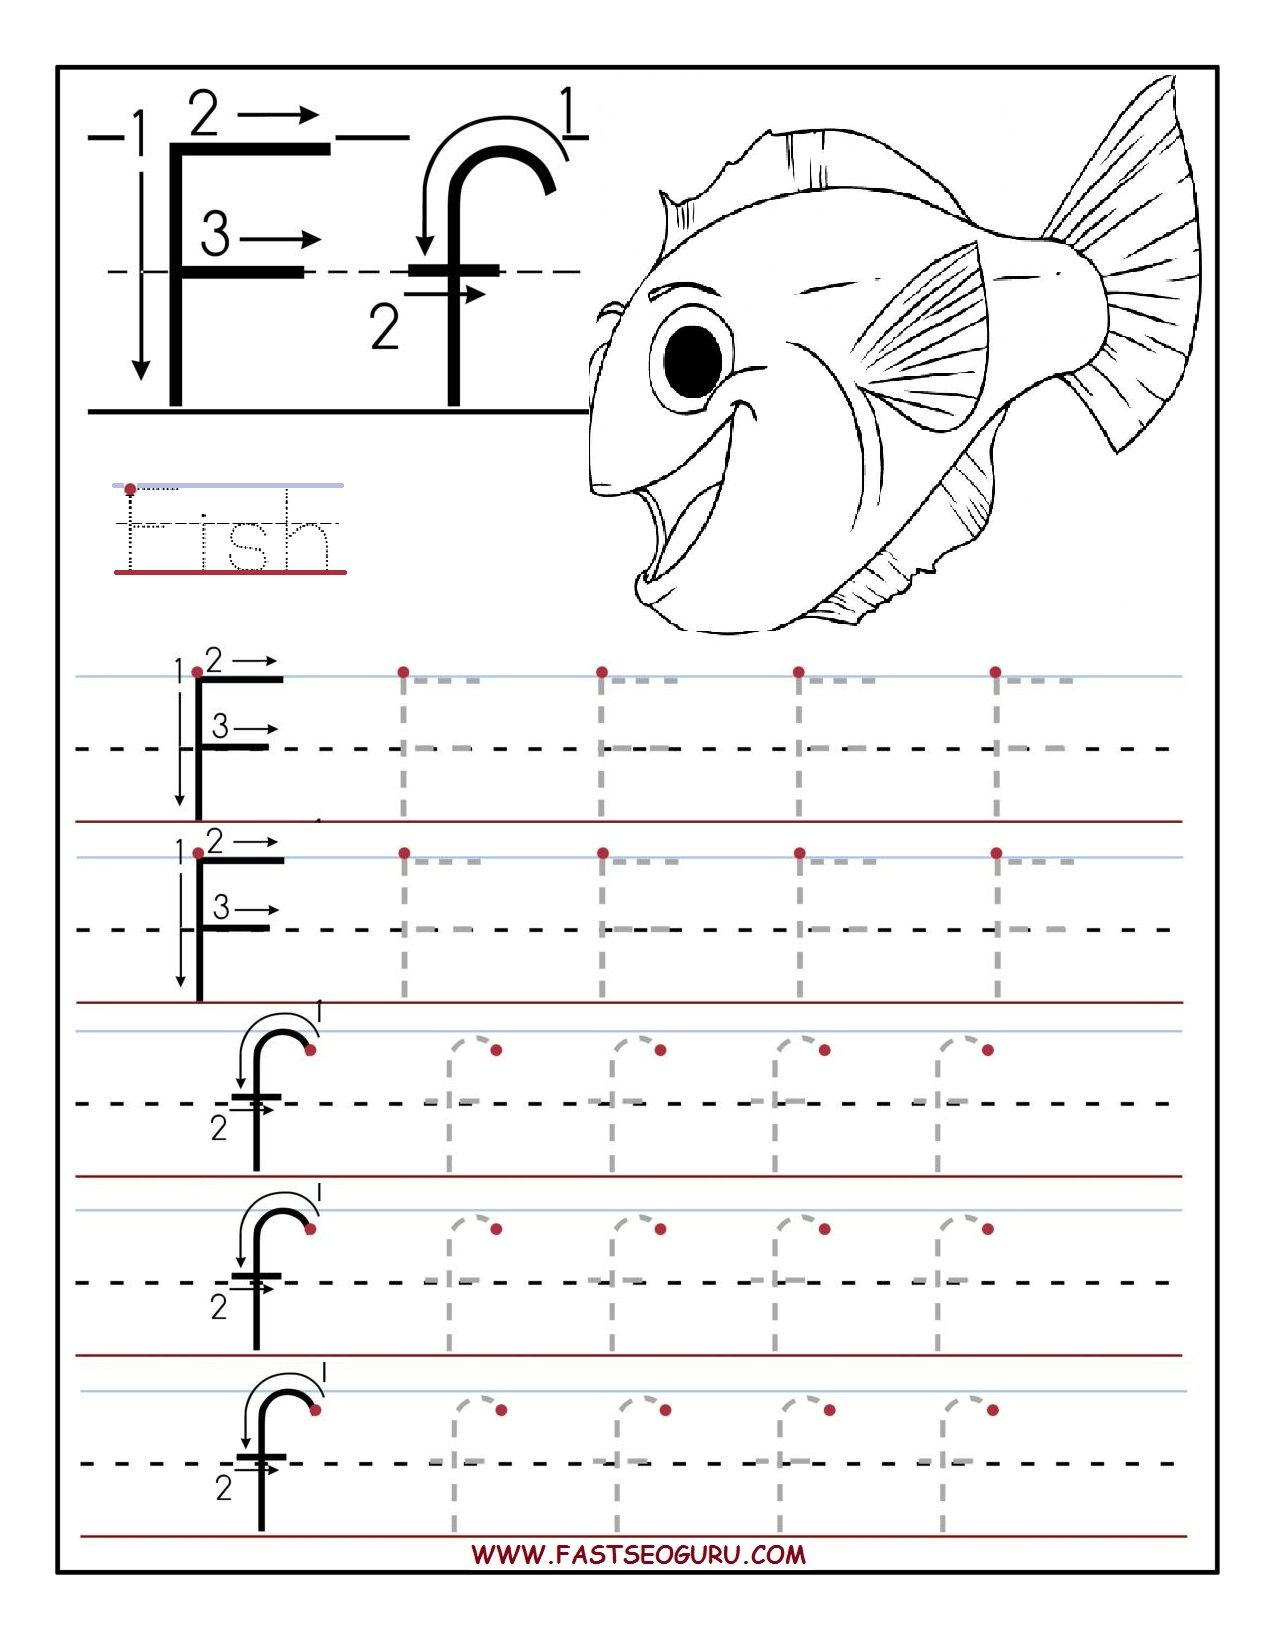 Printable Letter F Tracing Worksheets For Preschool inside Letter F Tracing Sheet